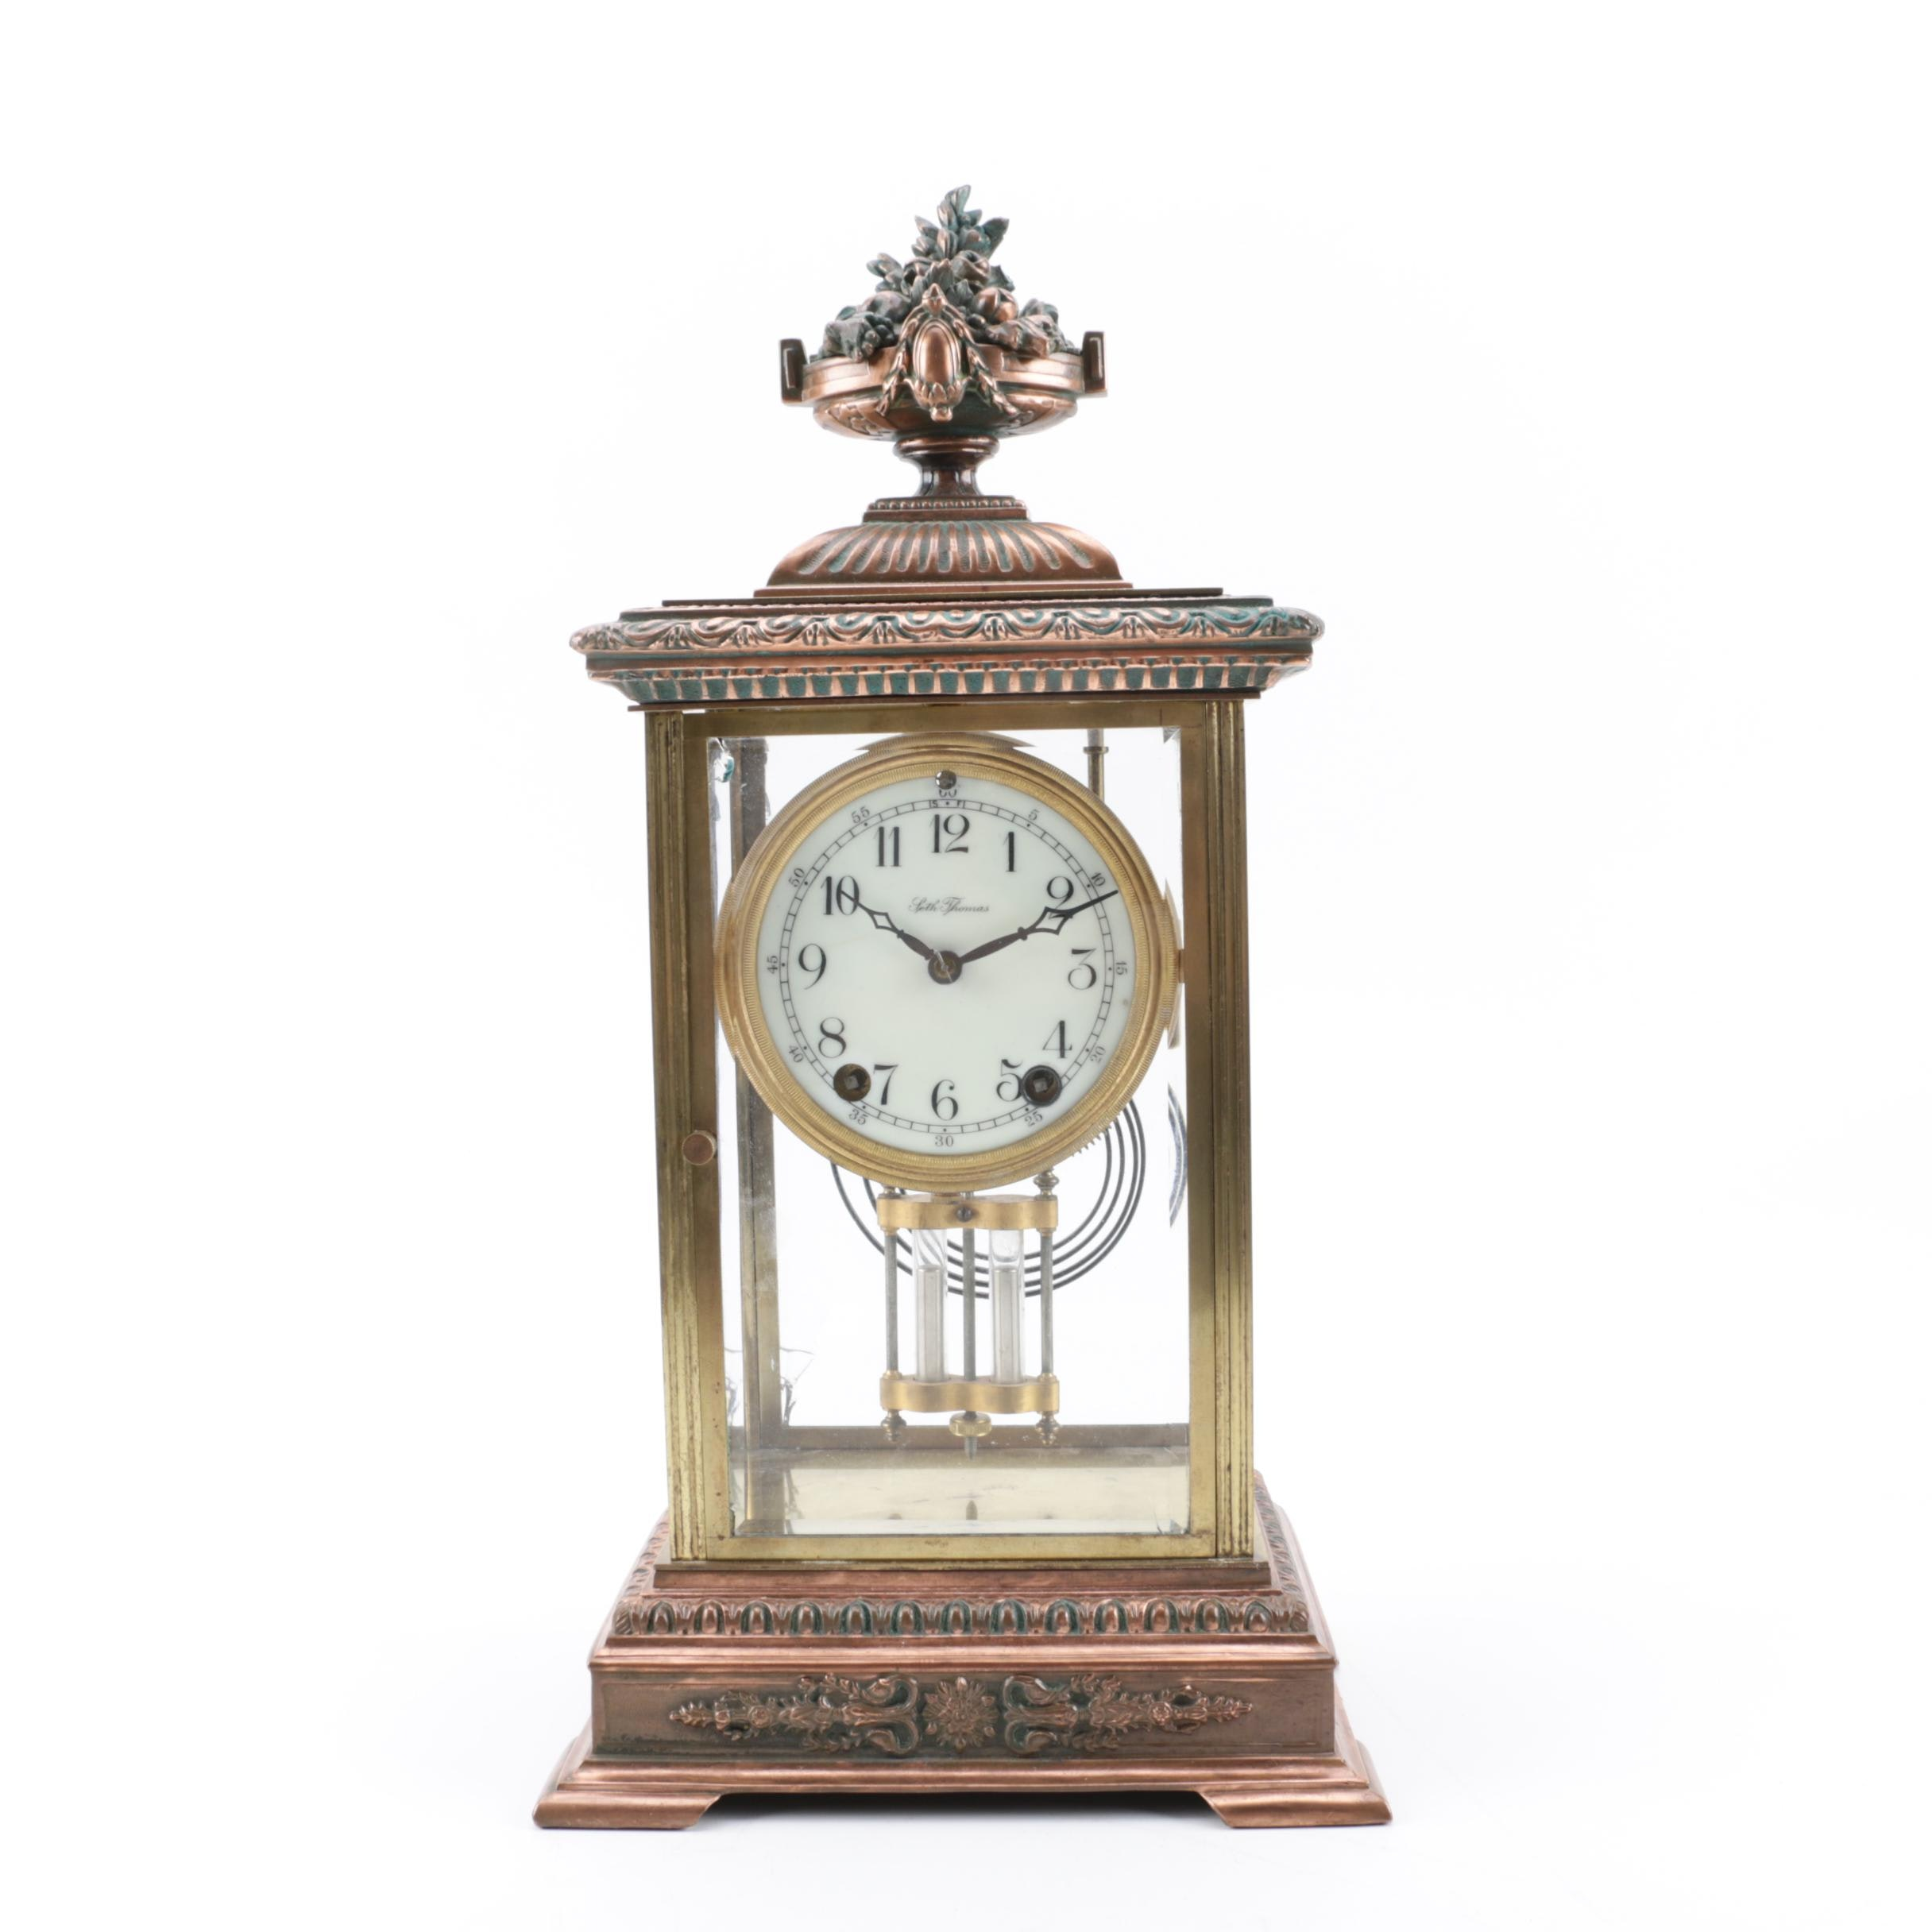 Seth Thomas French Empire Style Mantel Clock, Early 20th Century